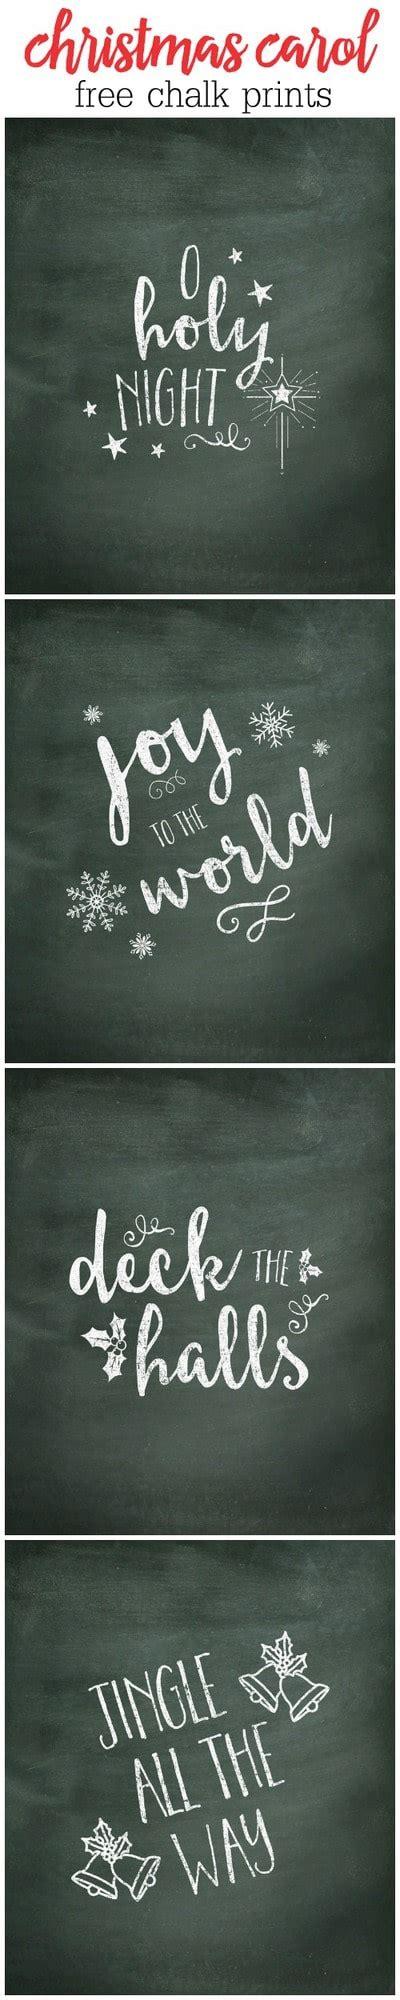 christmas carol chalk prints